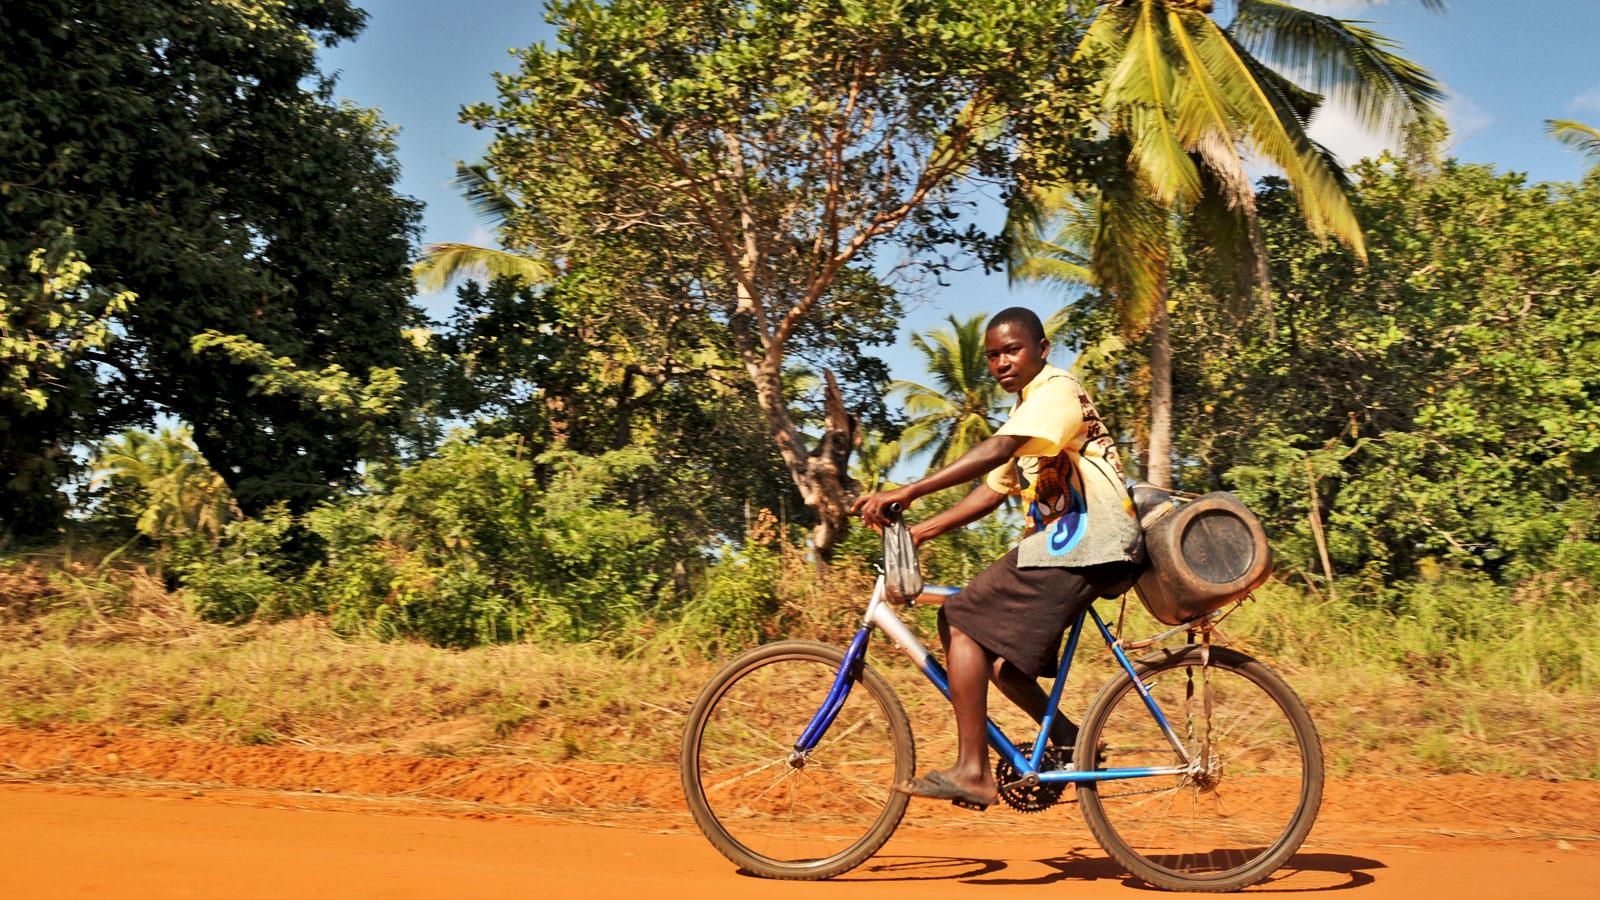 Sambia Erlenisreise in Kleingruppe traveljunkies